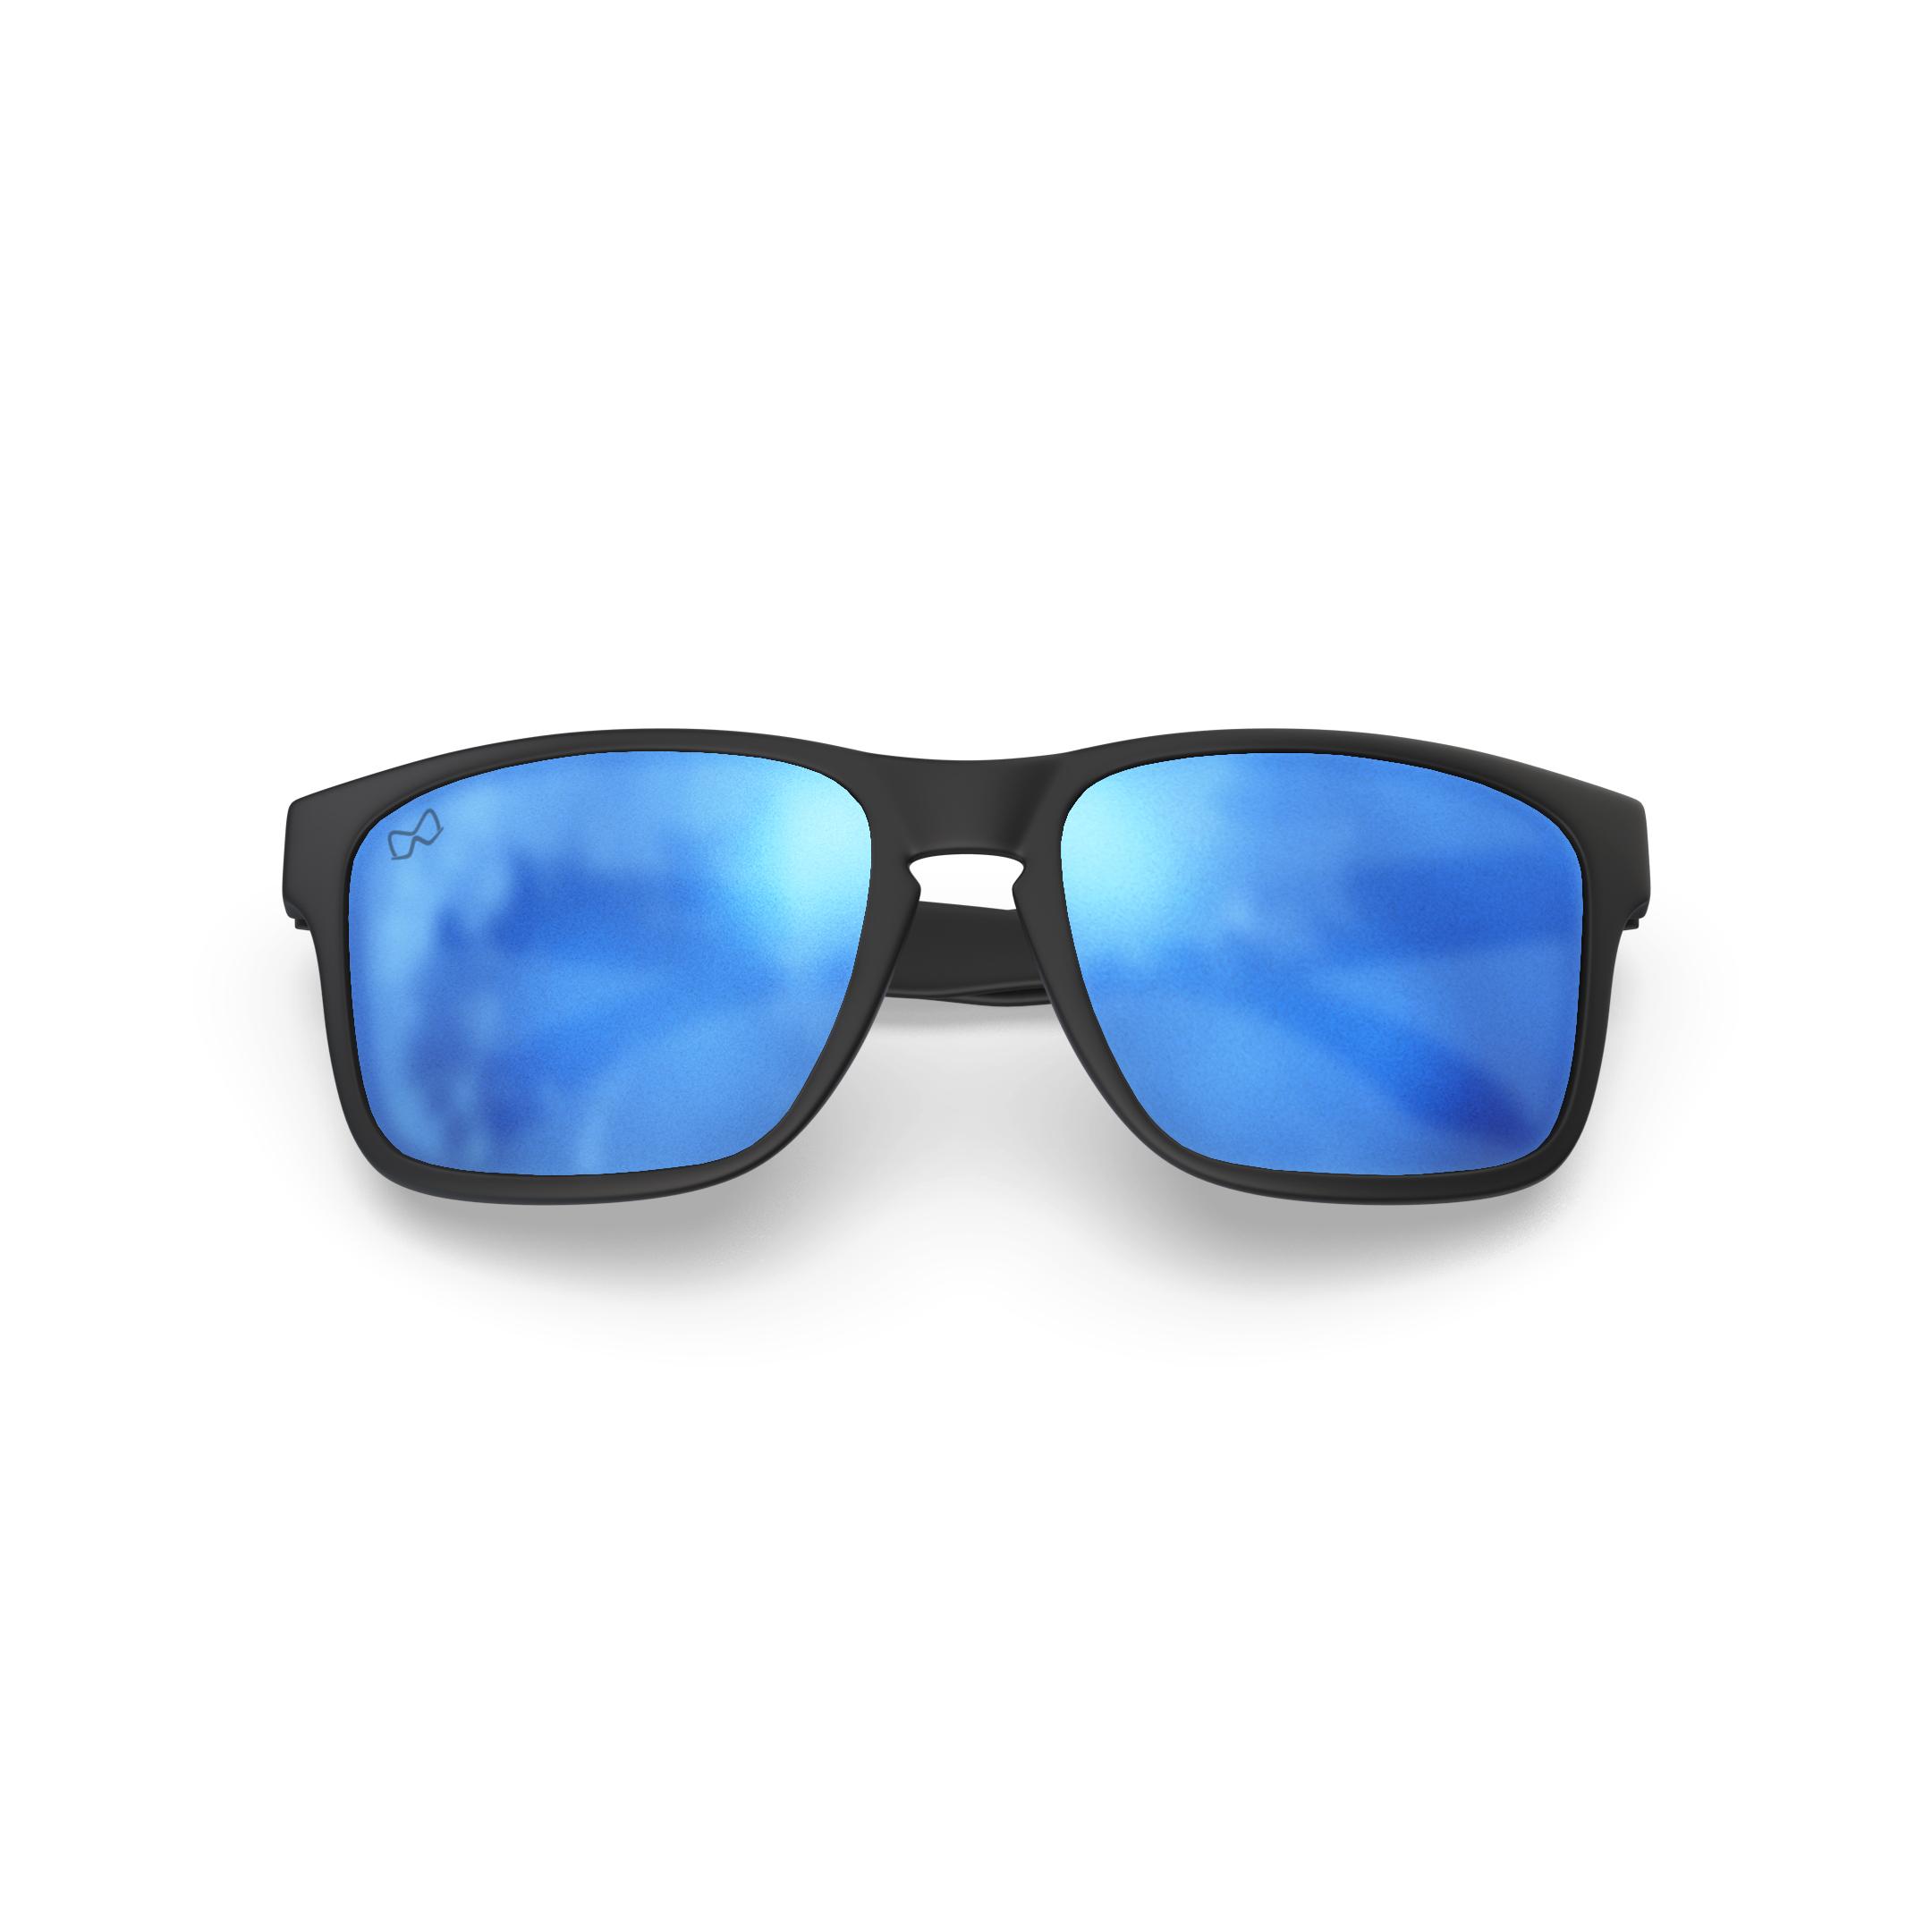 Mariener-Melange-Makan-Matte-Black-Matte-Reflective-Sky-Adult-Sunglasses-Zonnebril-Mat-Reflecterend-Volwassenen-Folded